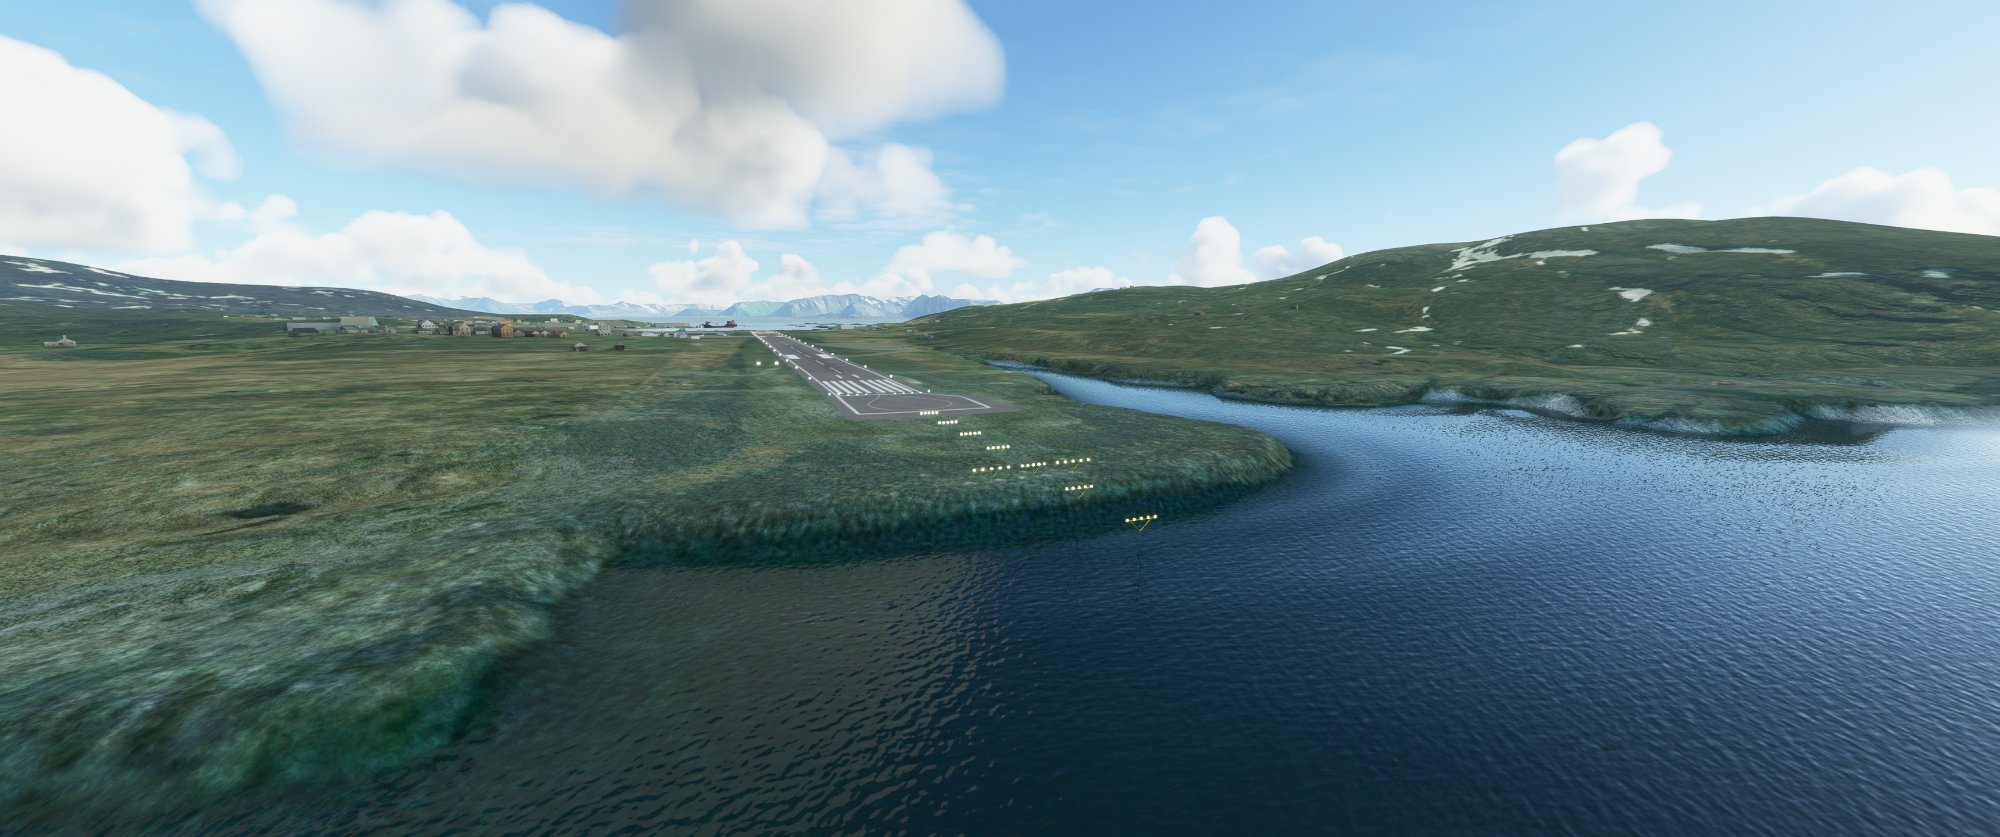 Microsoft Flight Simulator Screenshot 2020.11.19 - 15.42.45.87.jpg